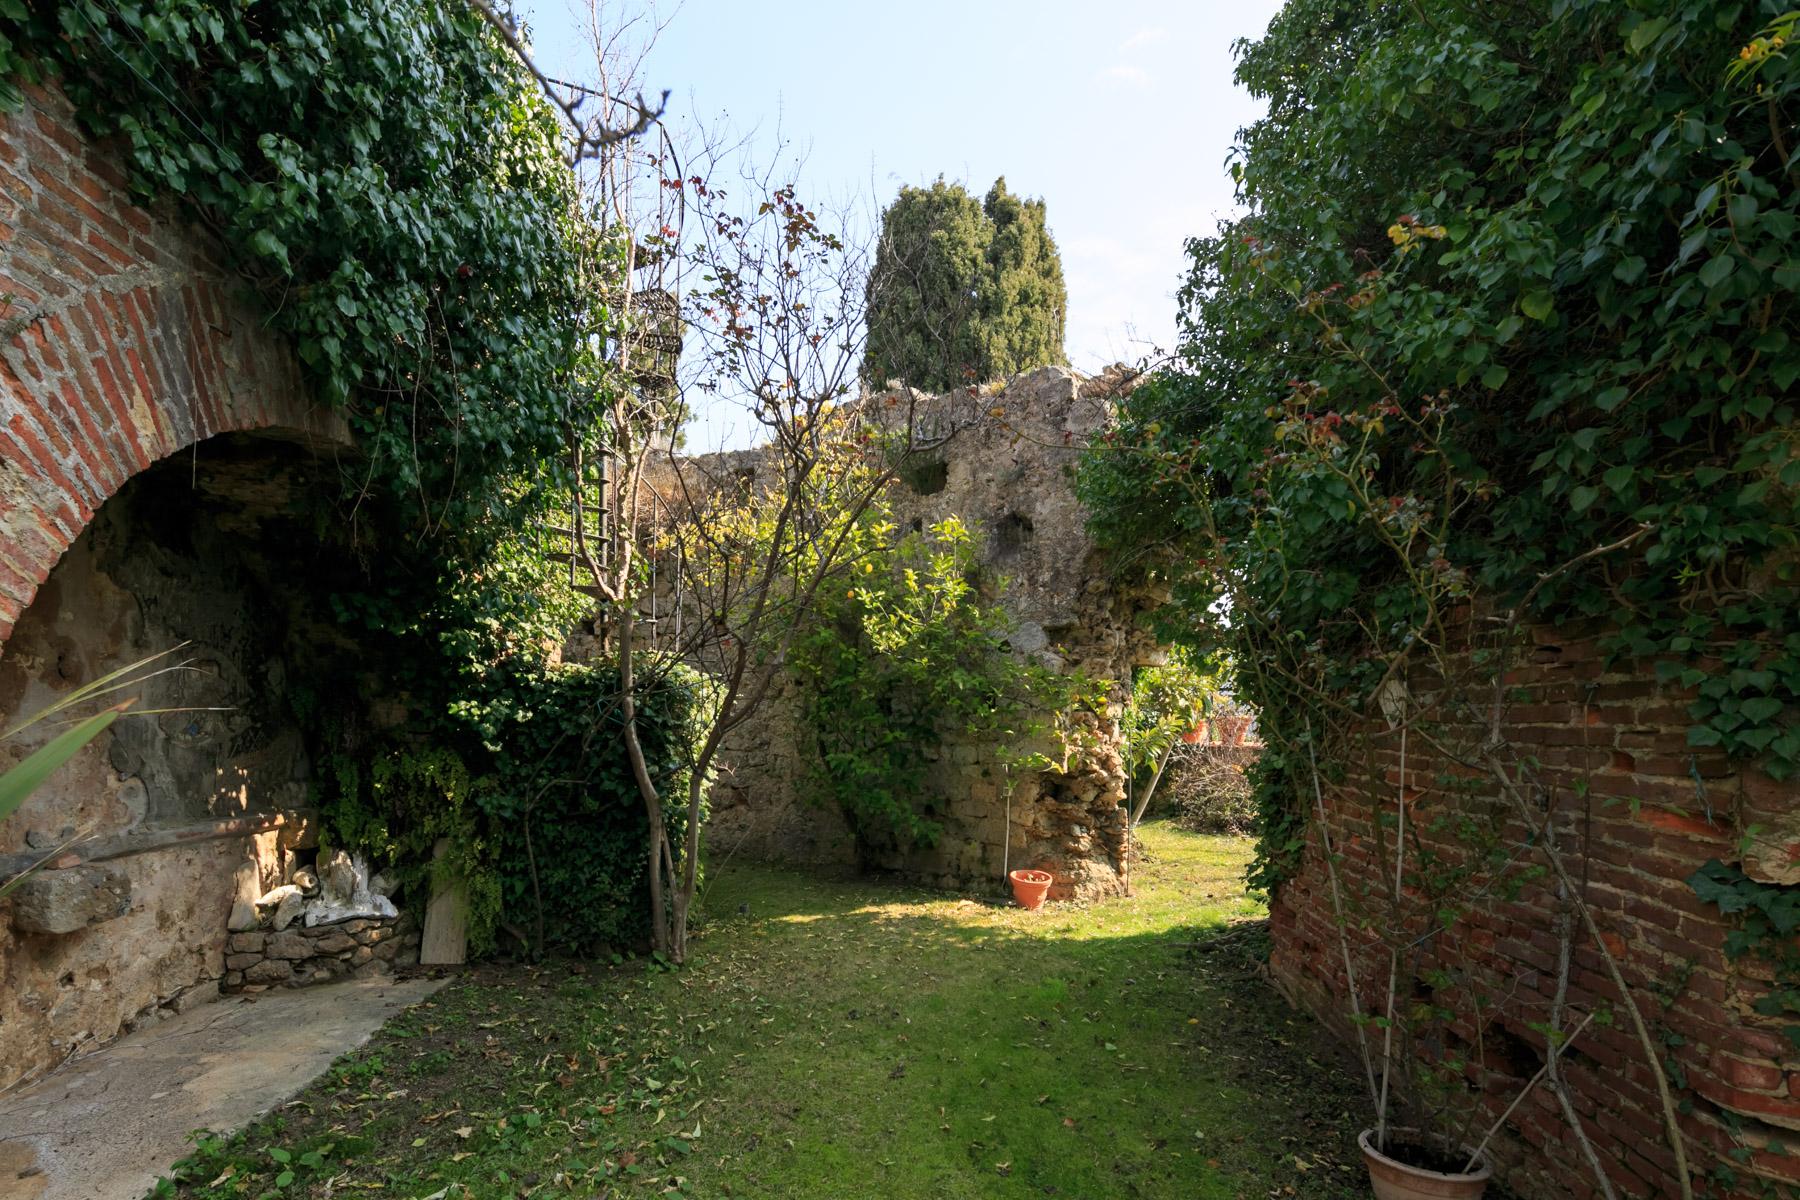 Villa in Vendita a Camaiore: 5 locali, 500 mq - Foto 25